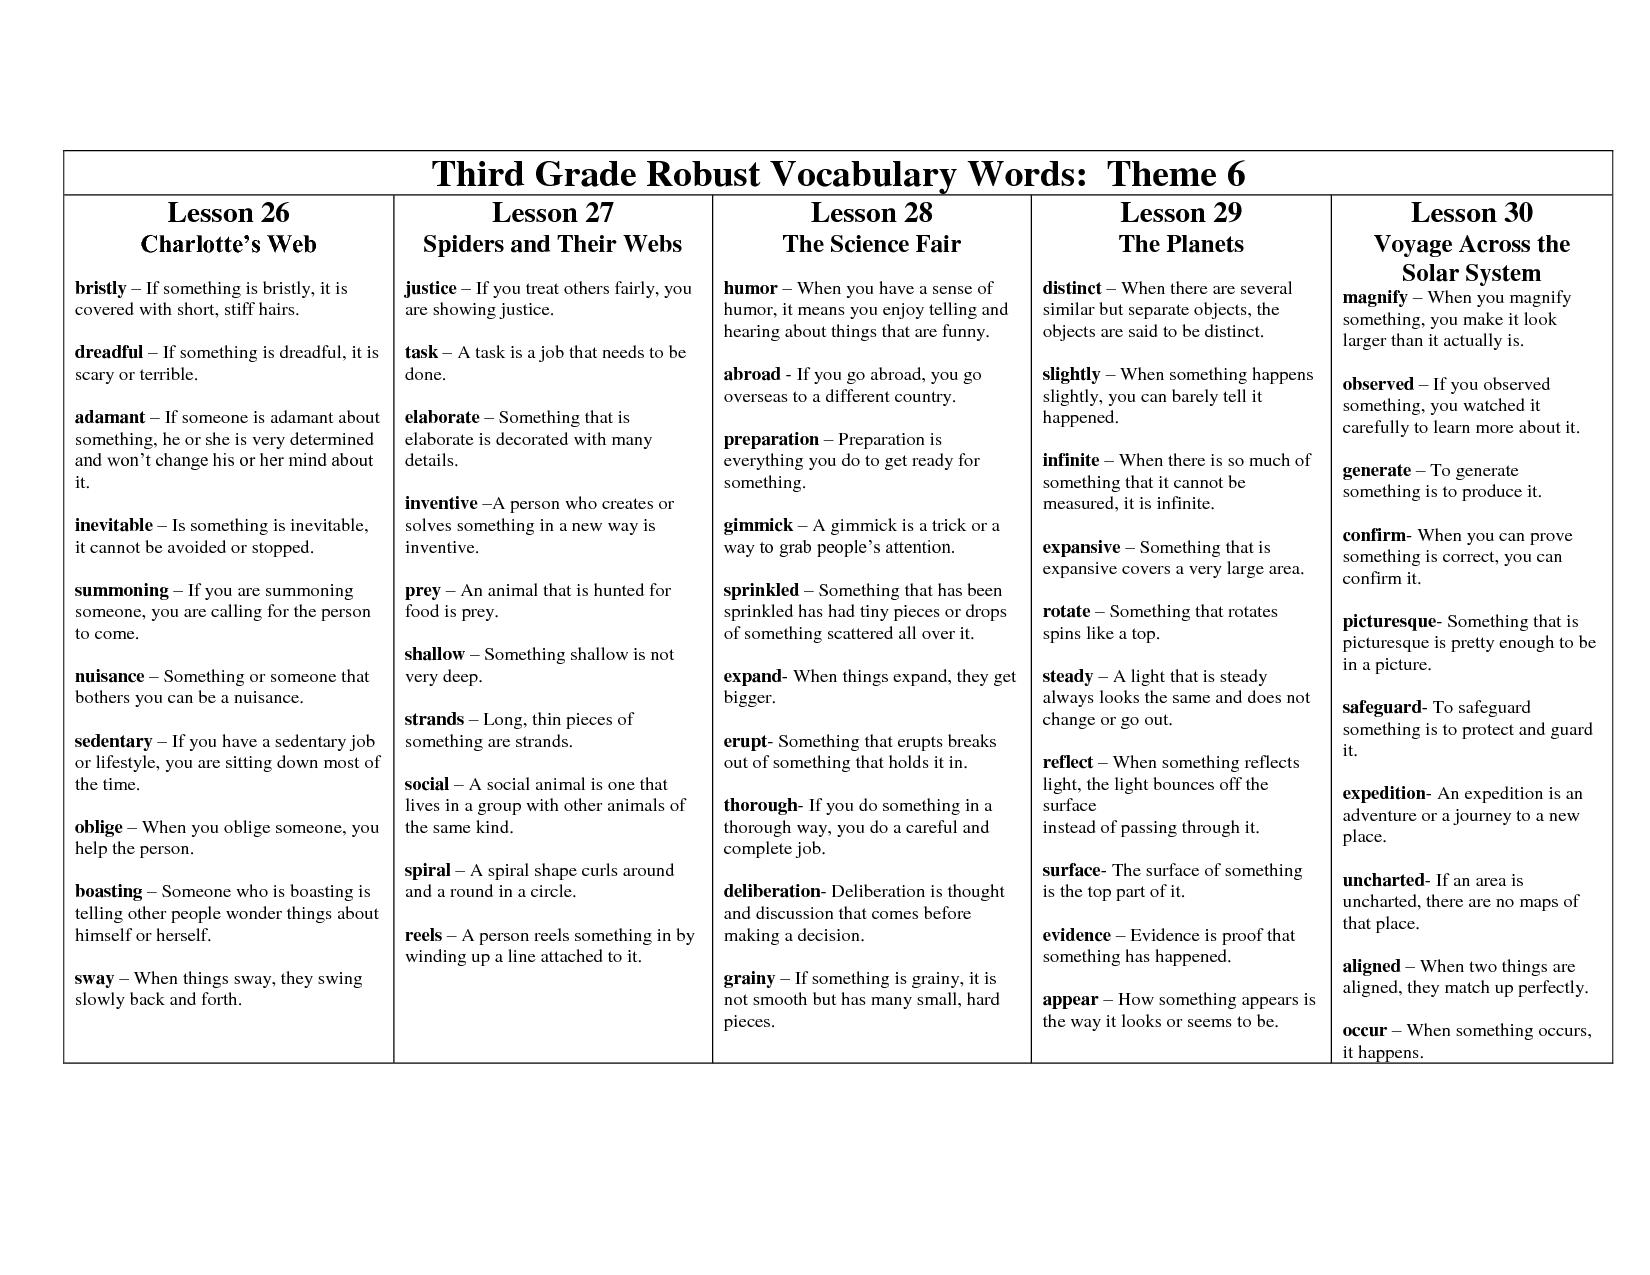 Third Grade Vocabulary Spelling